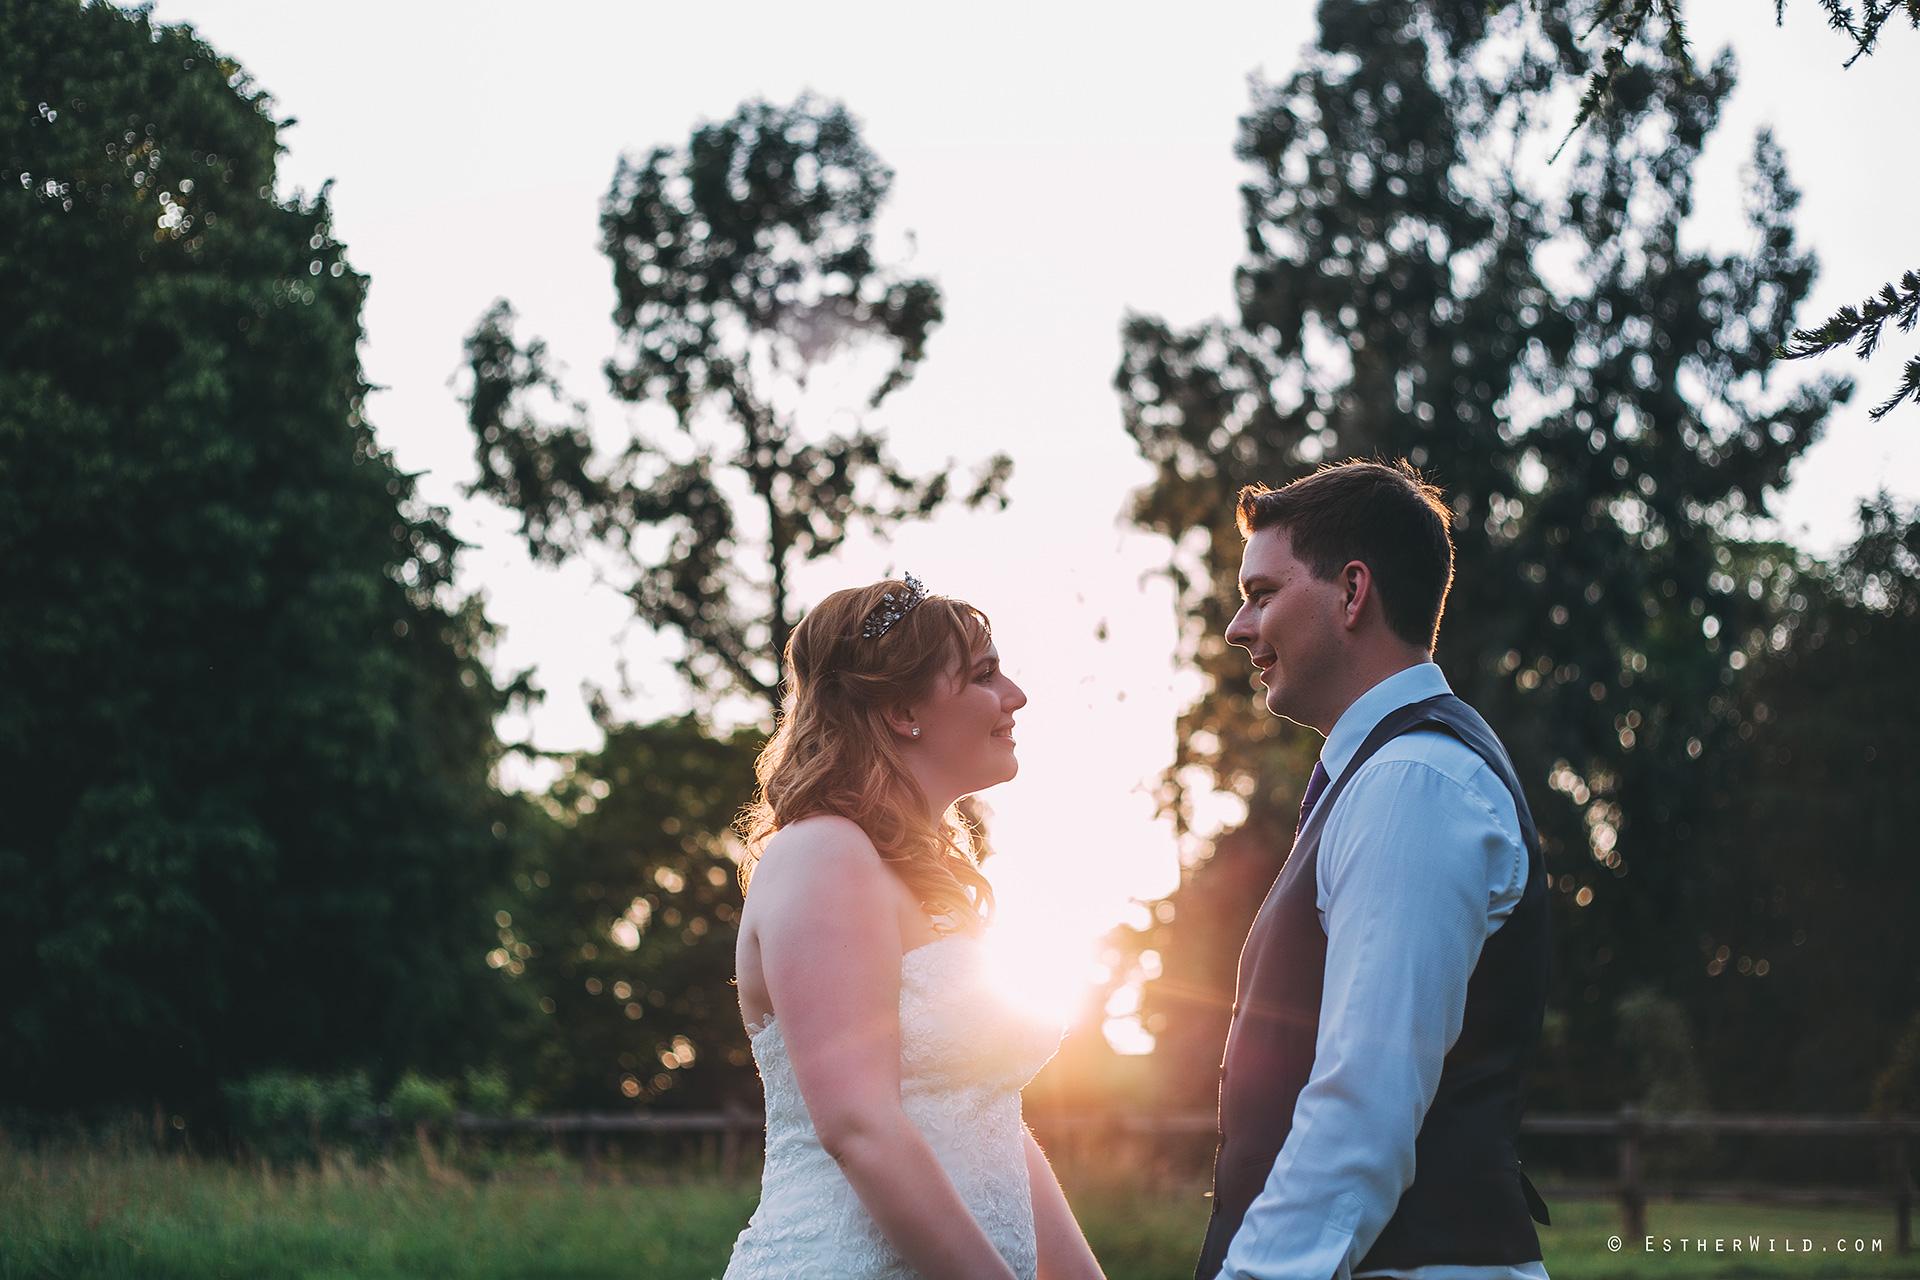 Norfolk_Wedding_Photographer_Mannington_Hall_Country_Esther_Wild_2506.jpg